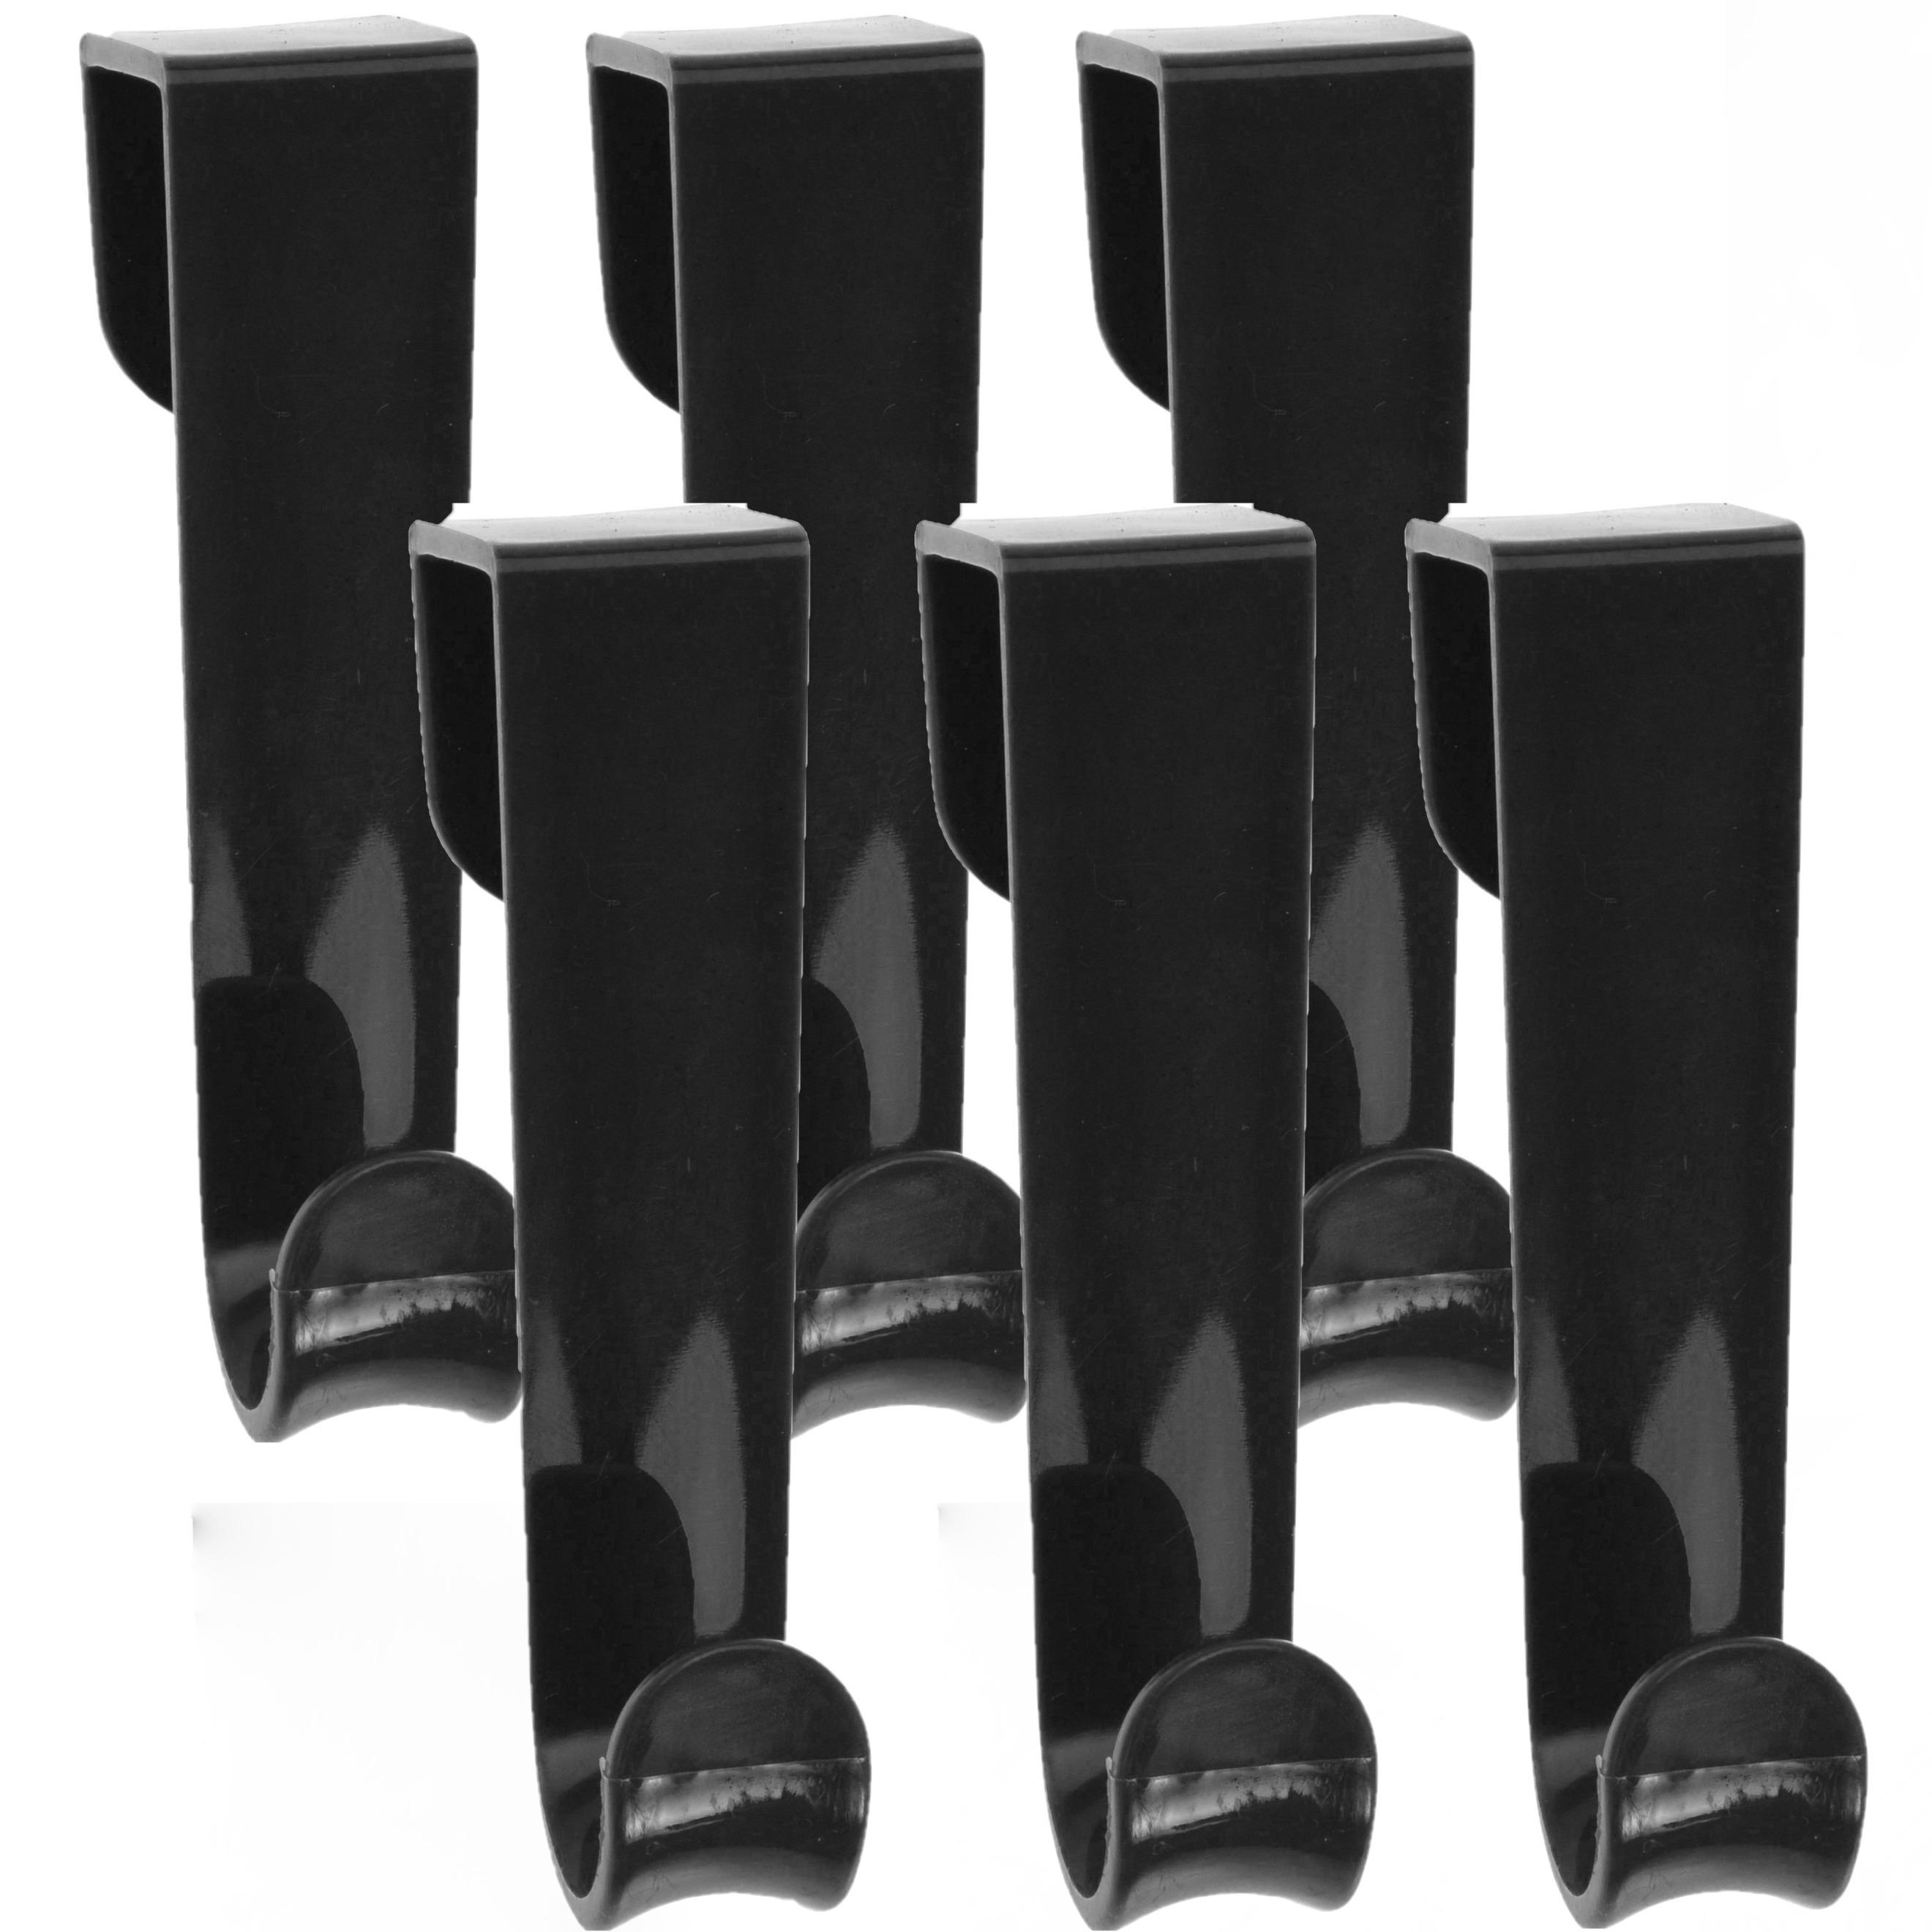 9x Zwarte deur kapstokhaken met enkele haak 12 cm